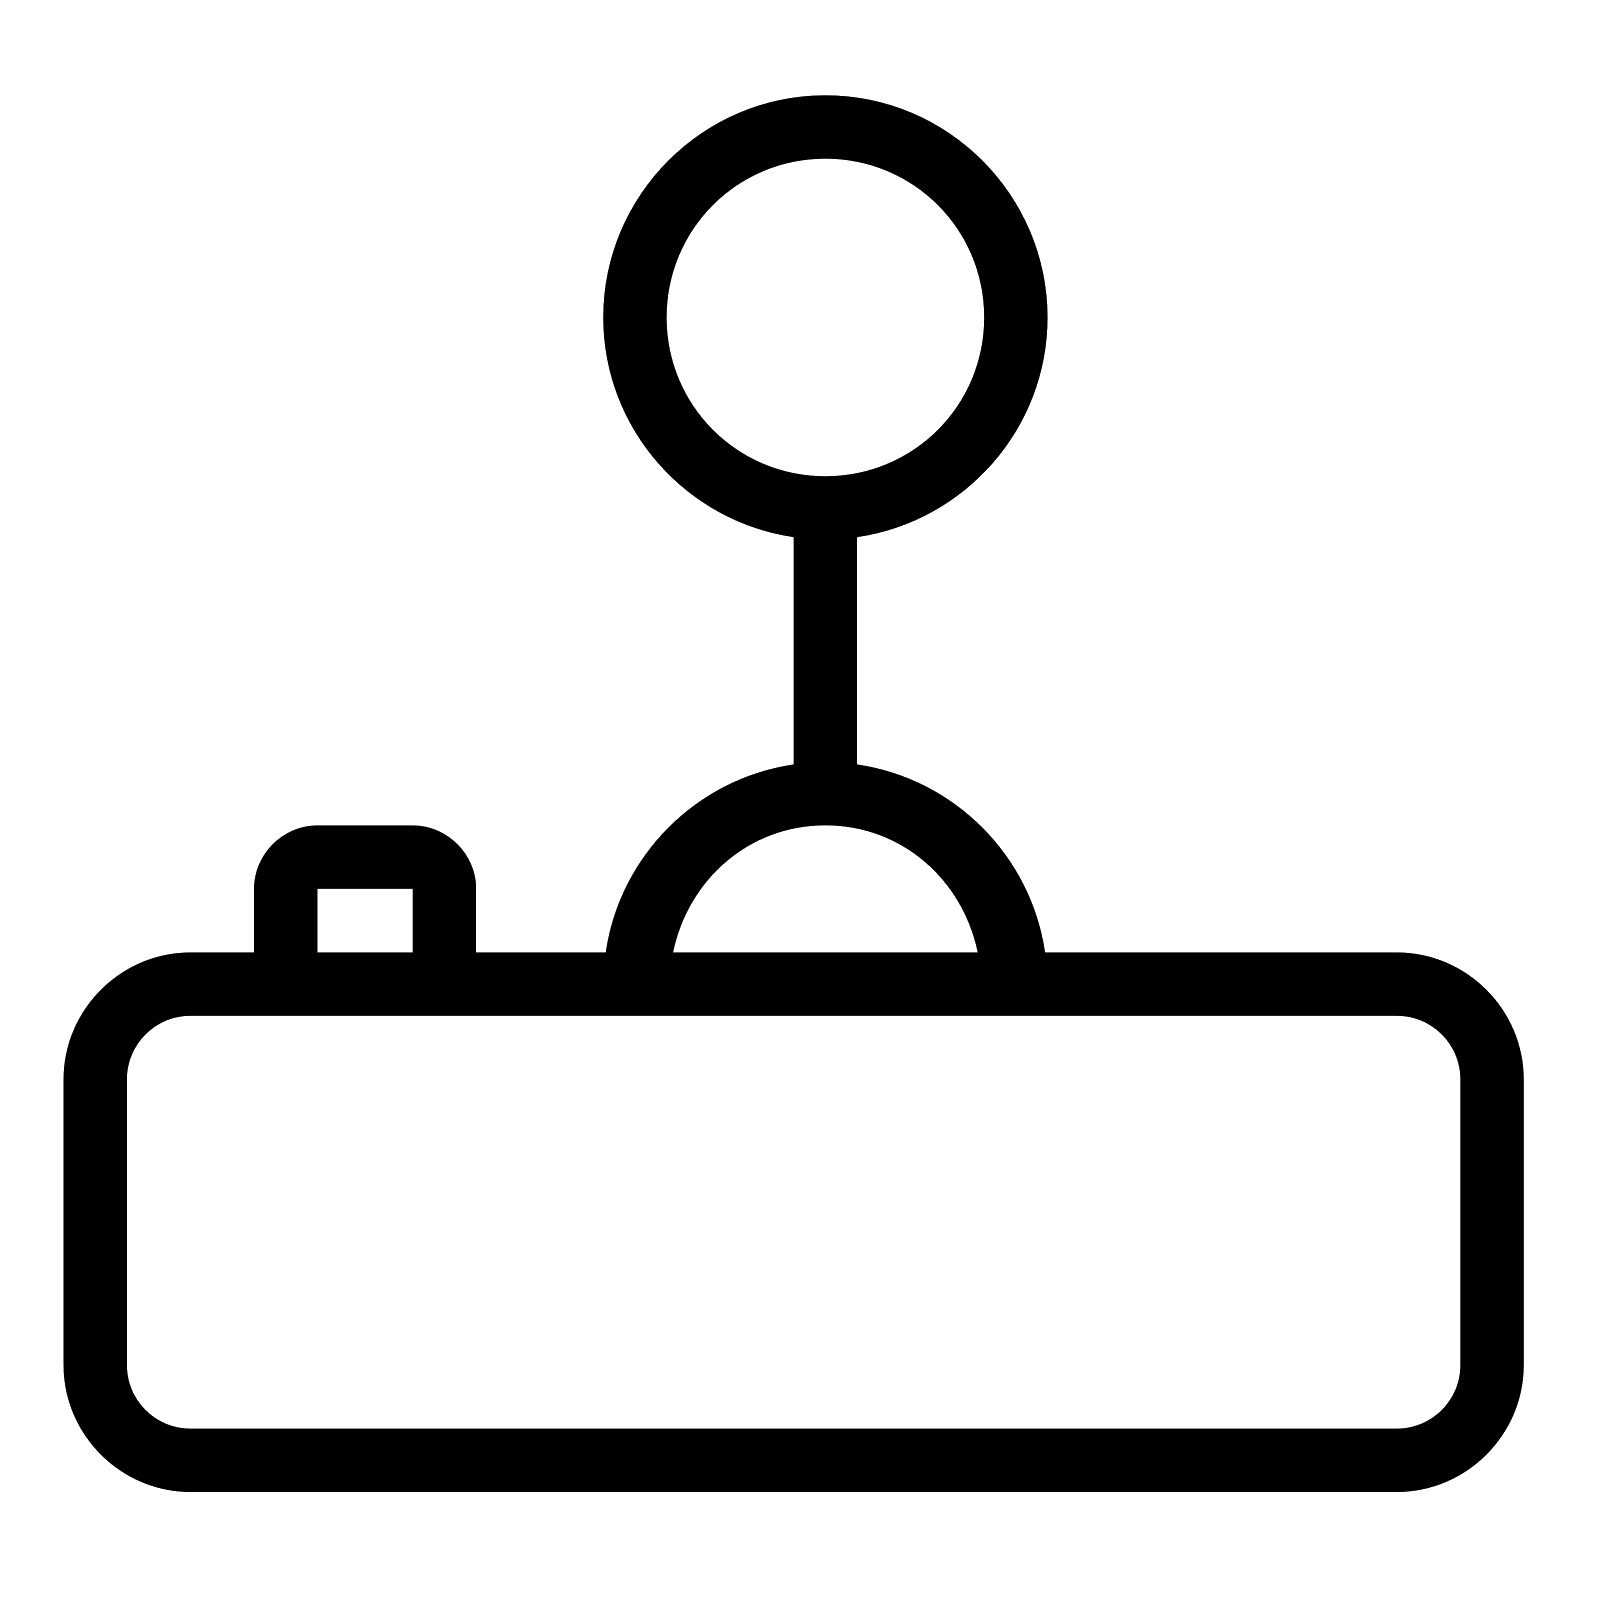 Cotton clipart stick png. Joystick icon free download